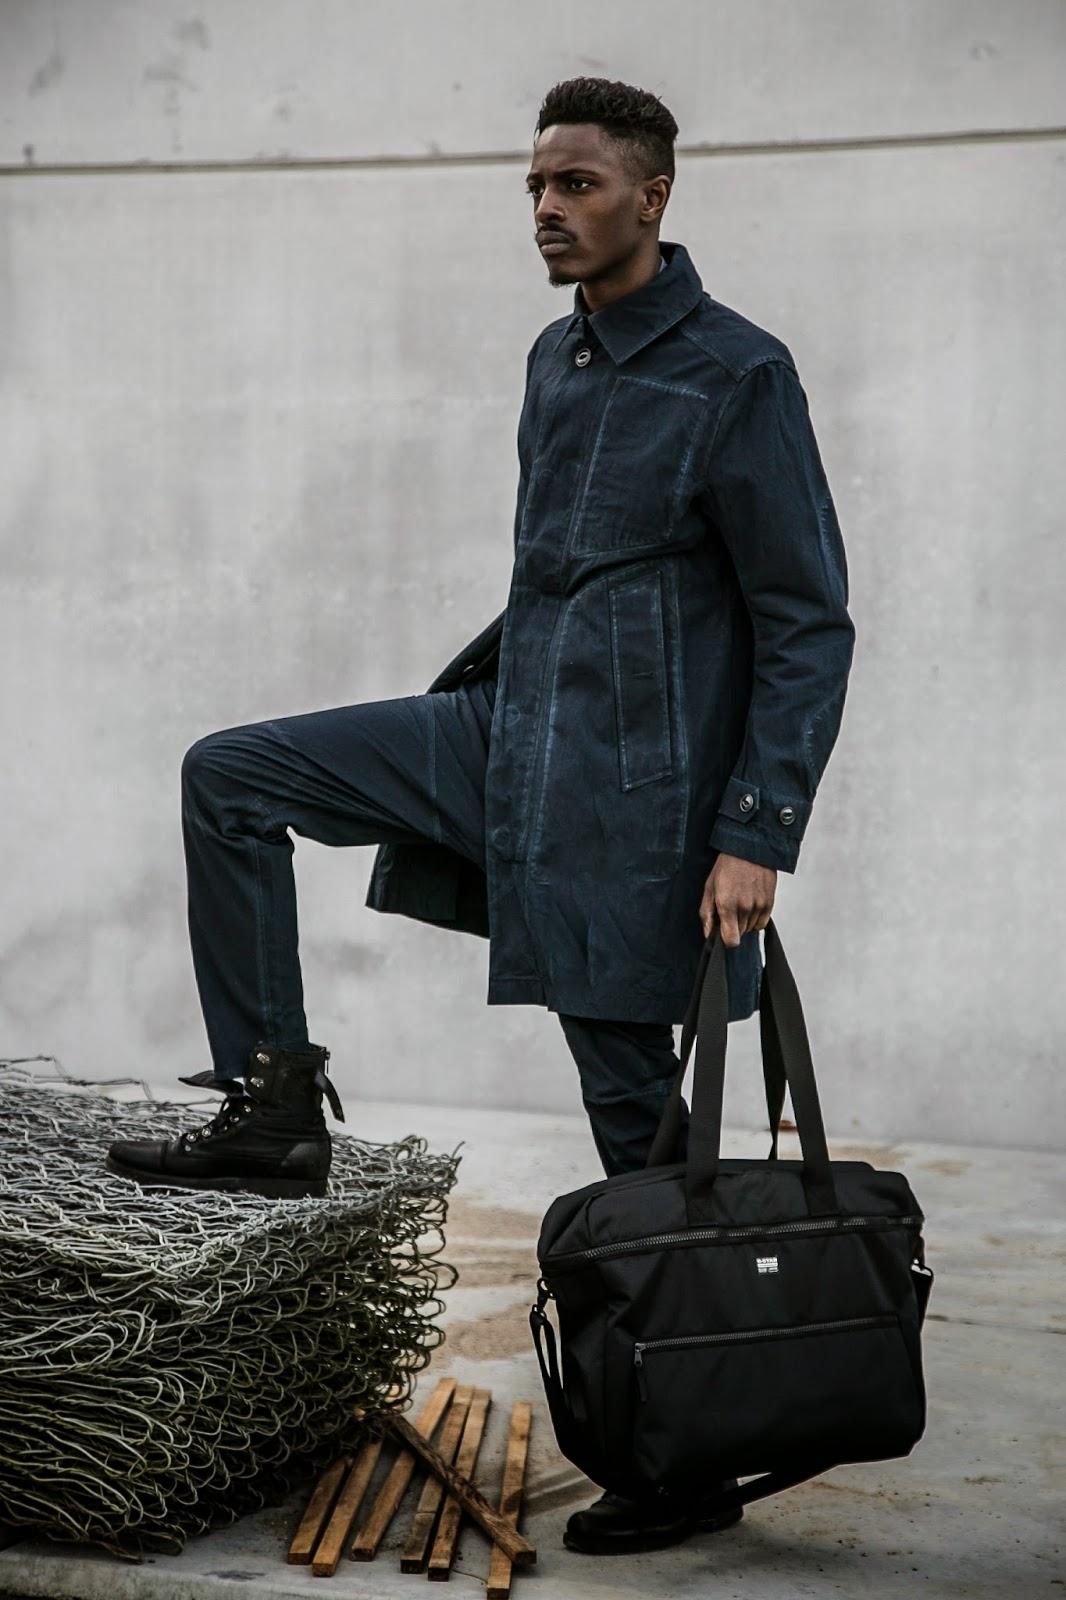 JONTHEGOLD fOR GSTAR RAW  blue collar worker denim look